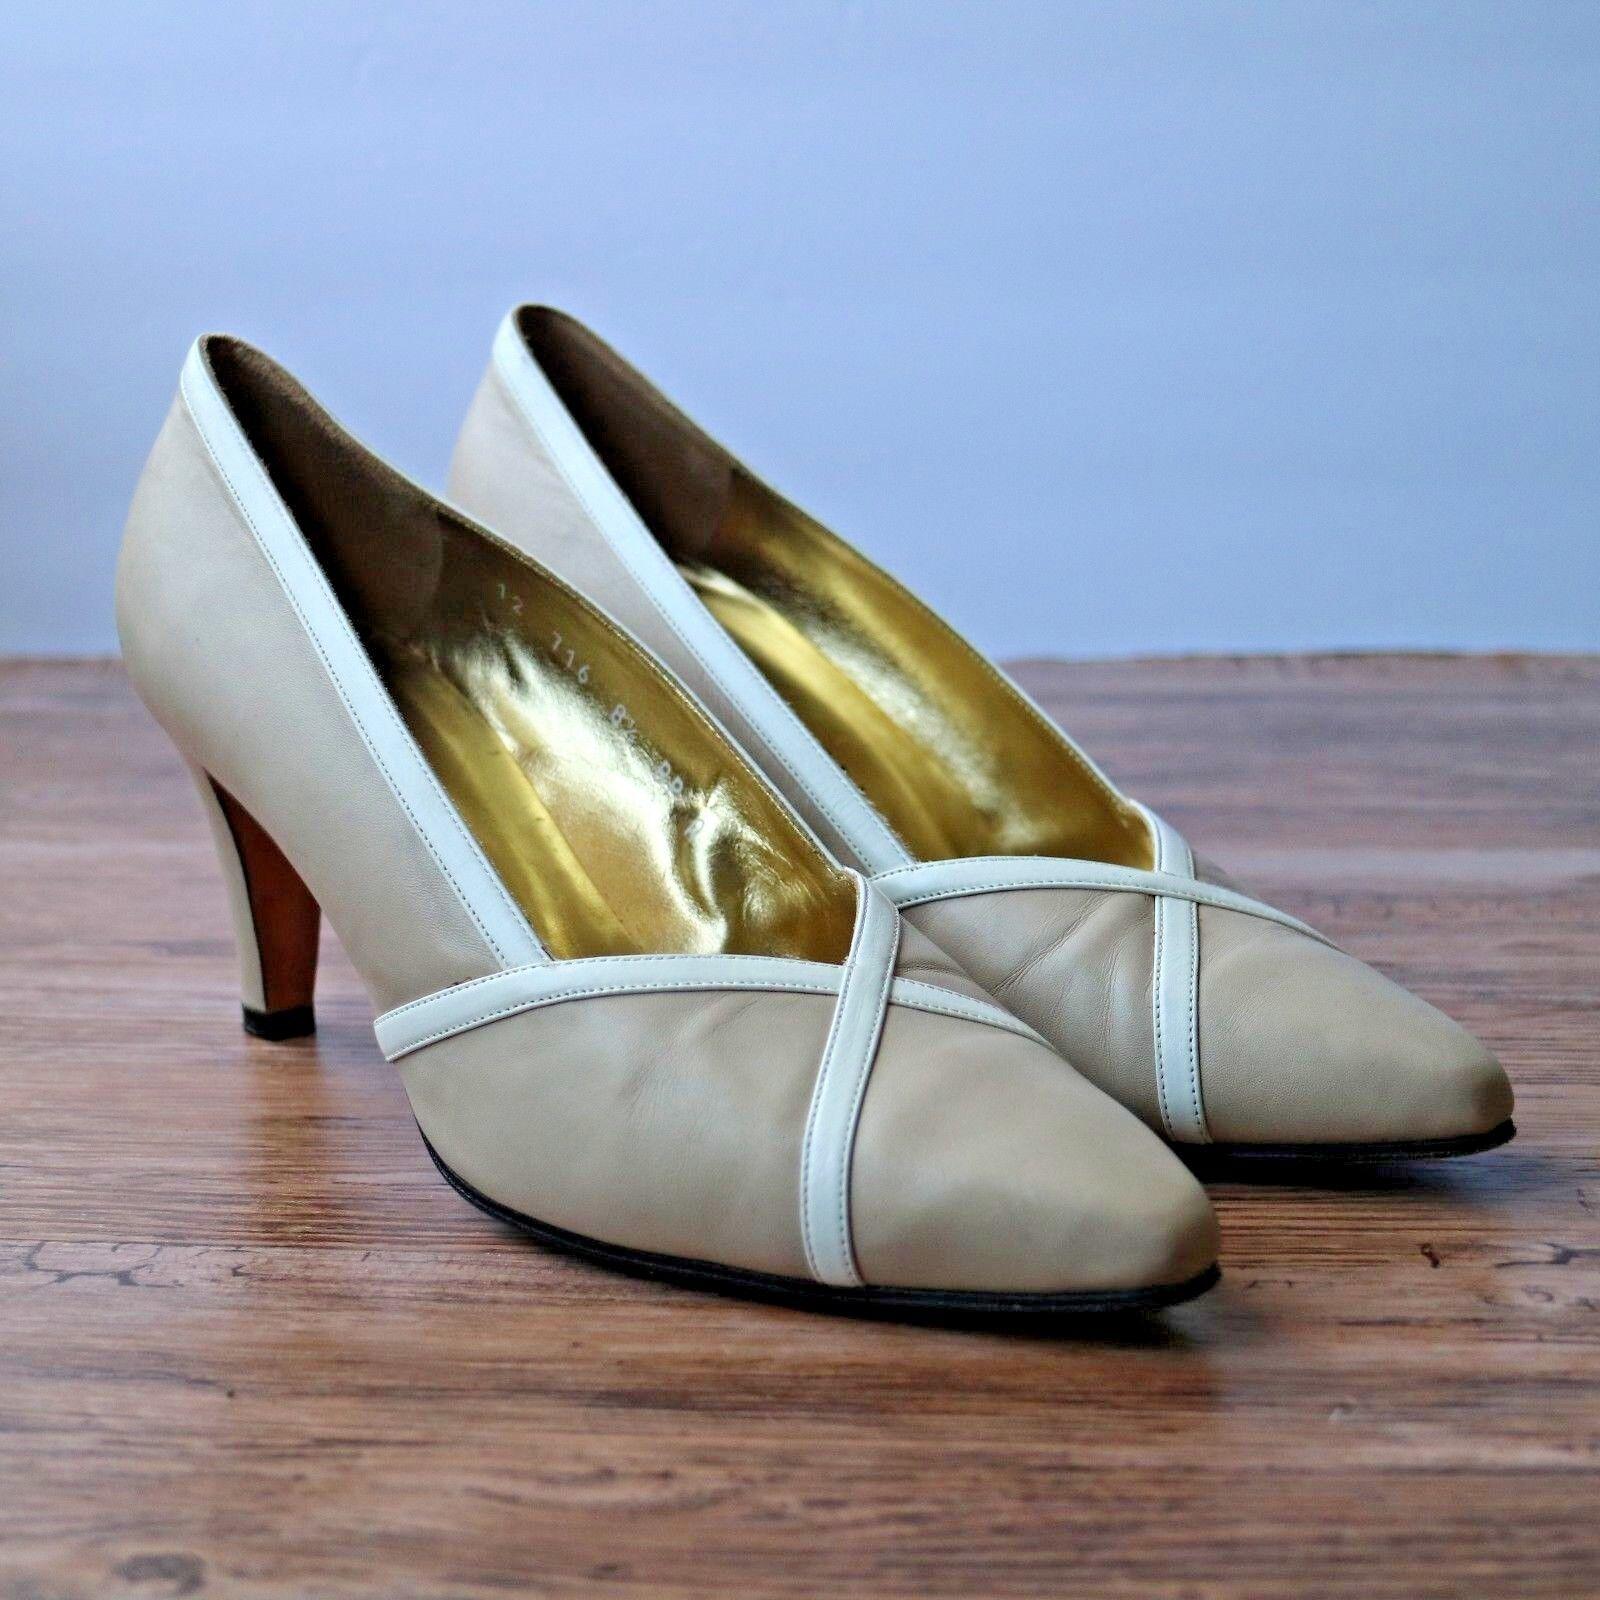 St Johns femmes Taupe Beige blanc Suede Point Toe Slip On Pumps Heels Sz 8.5